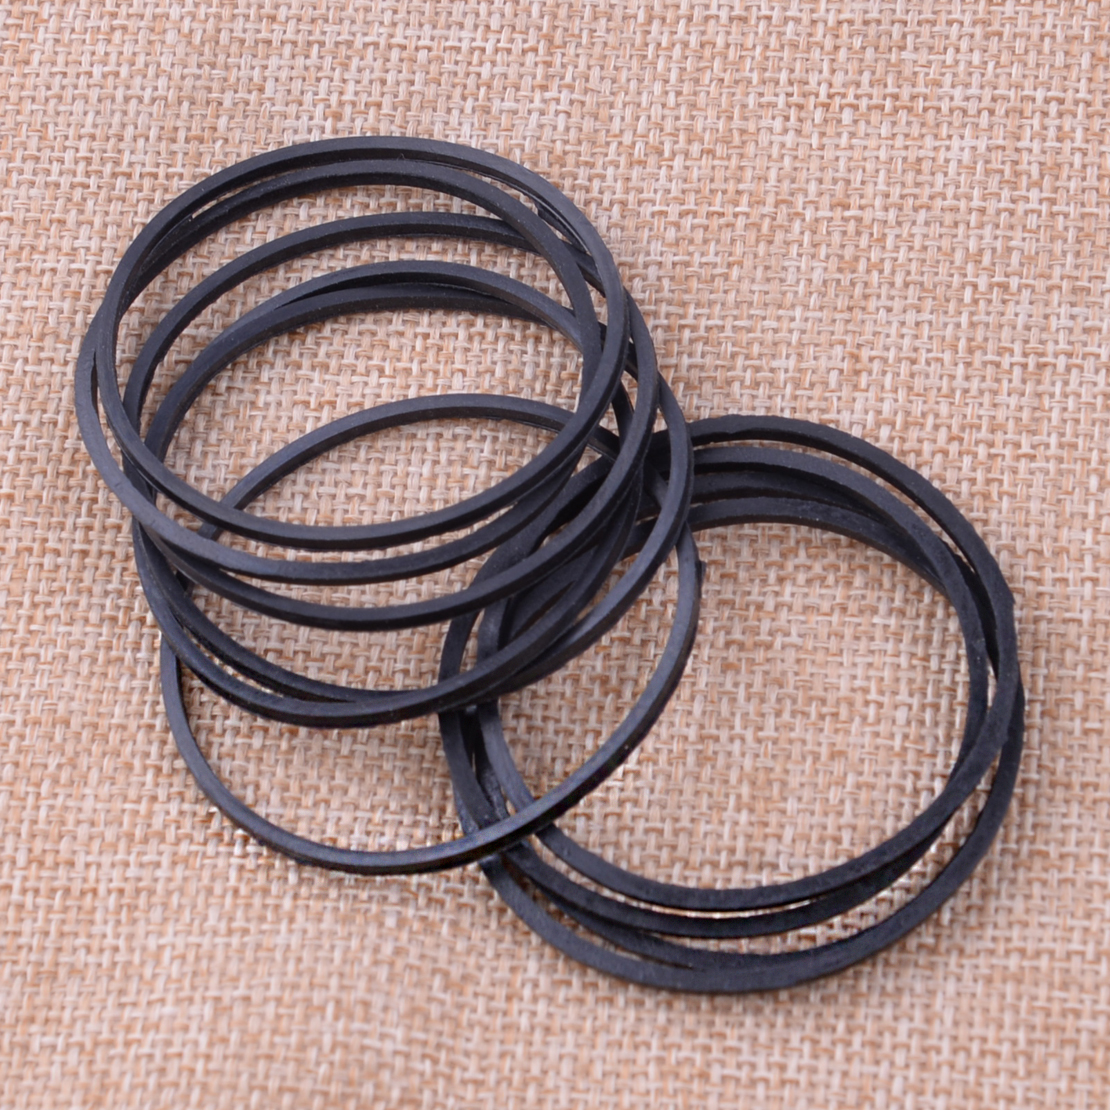 LETAOSK 10pcs Black Rubber Carburetor Fuel Float Bowl Seal Ring Gaskets 693981 280492 Fit For Briggs & Stratton